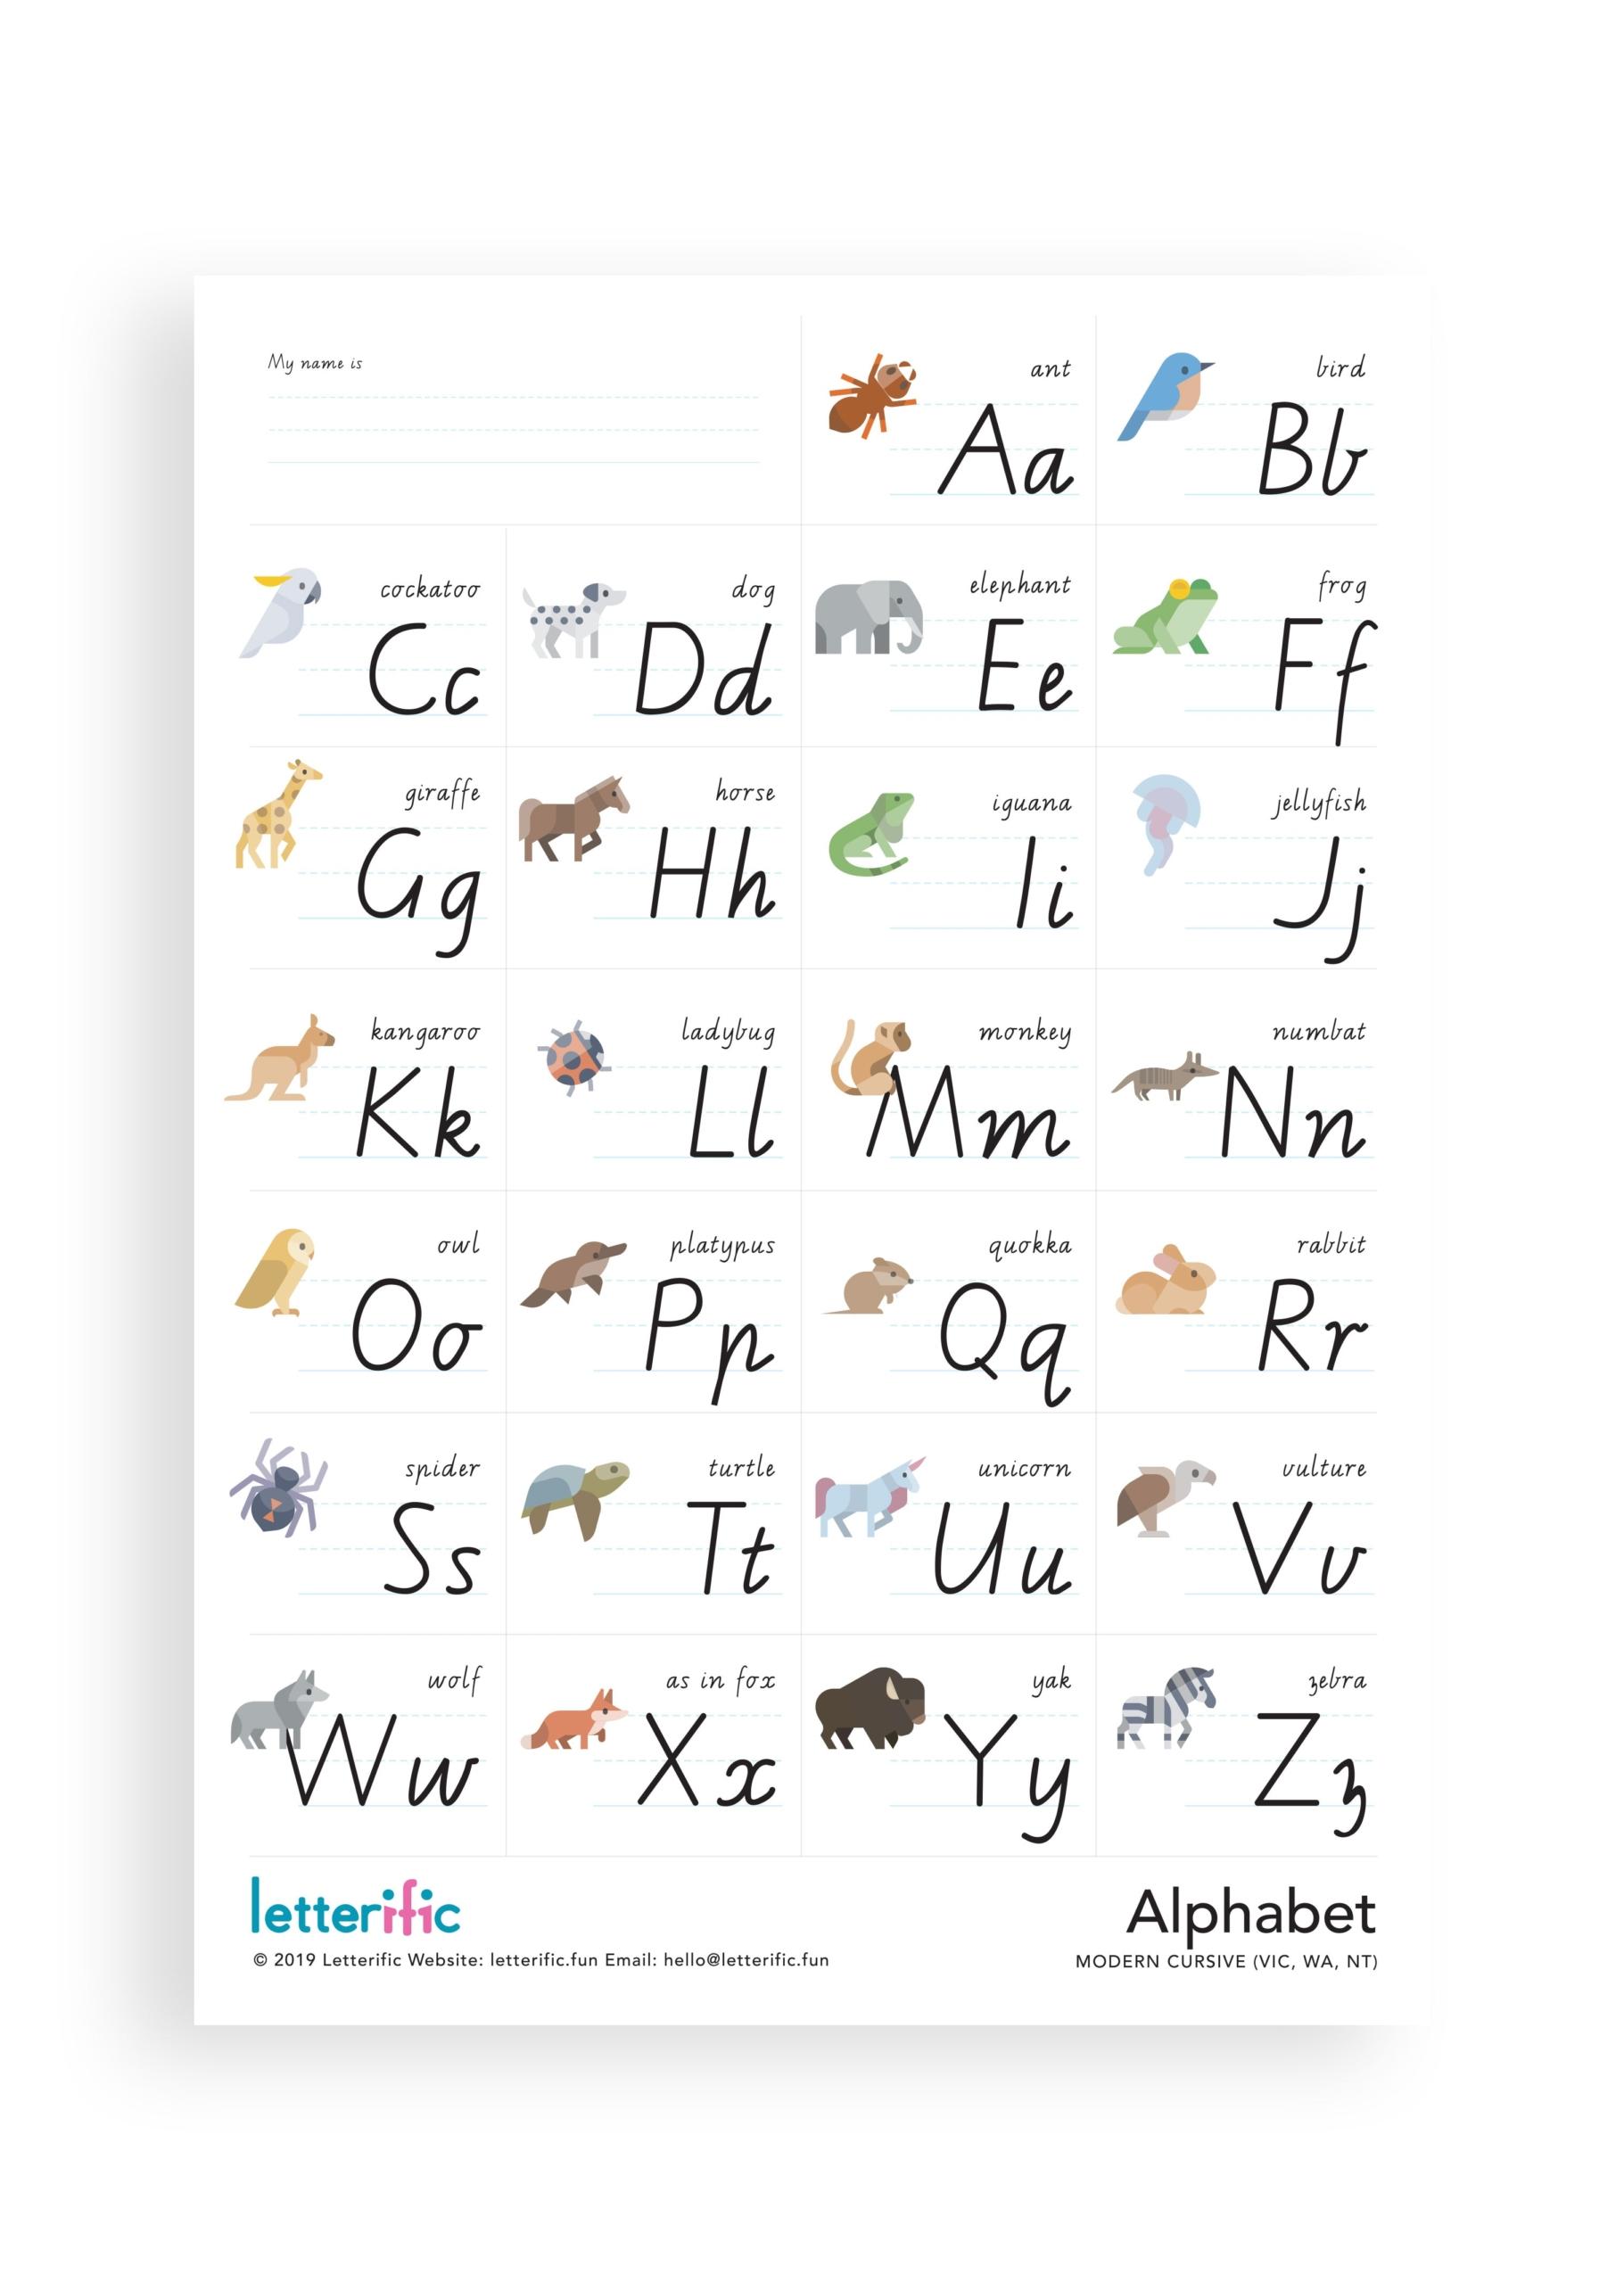 New! Alphabet Posters Vic/wa/nt Modern Cursiveletterific